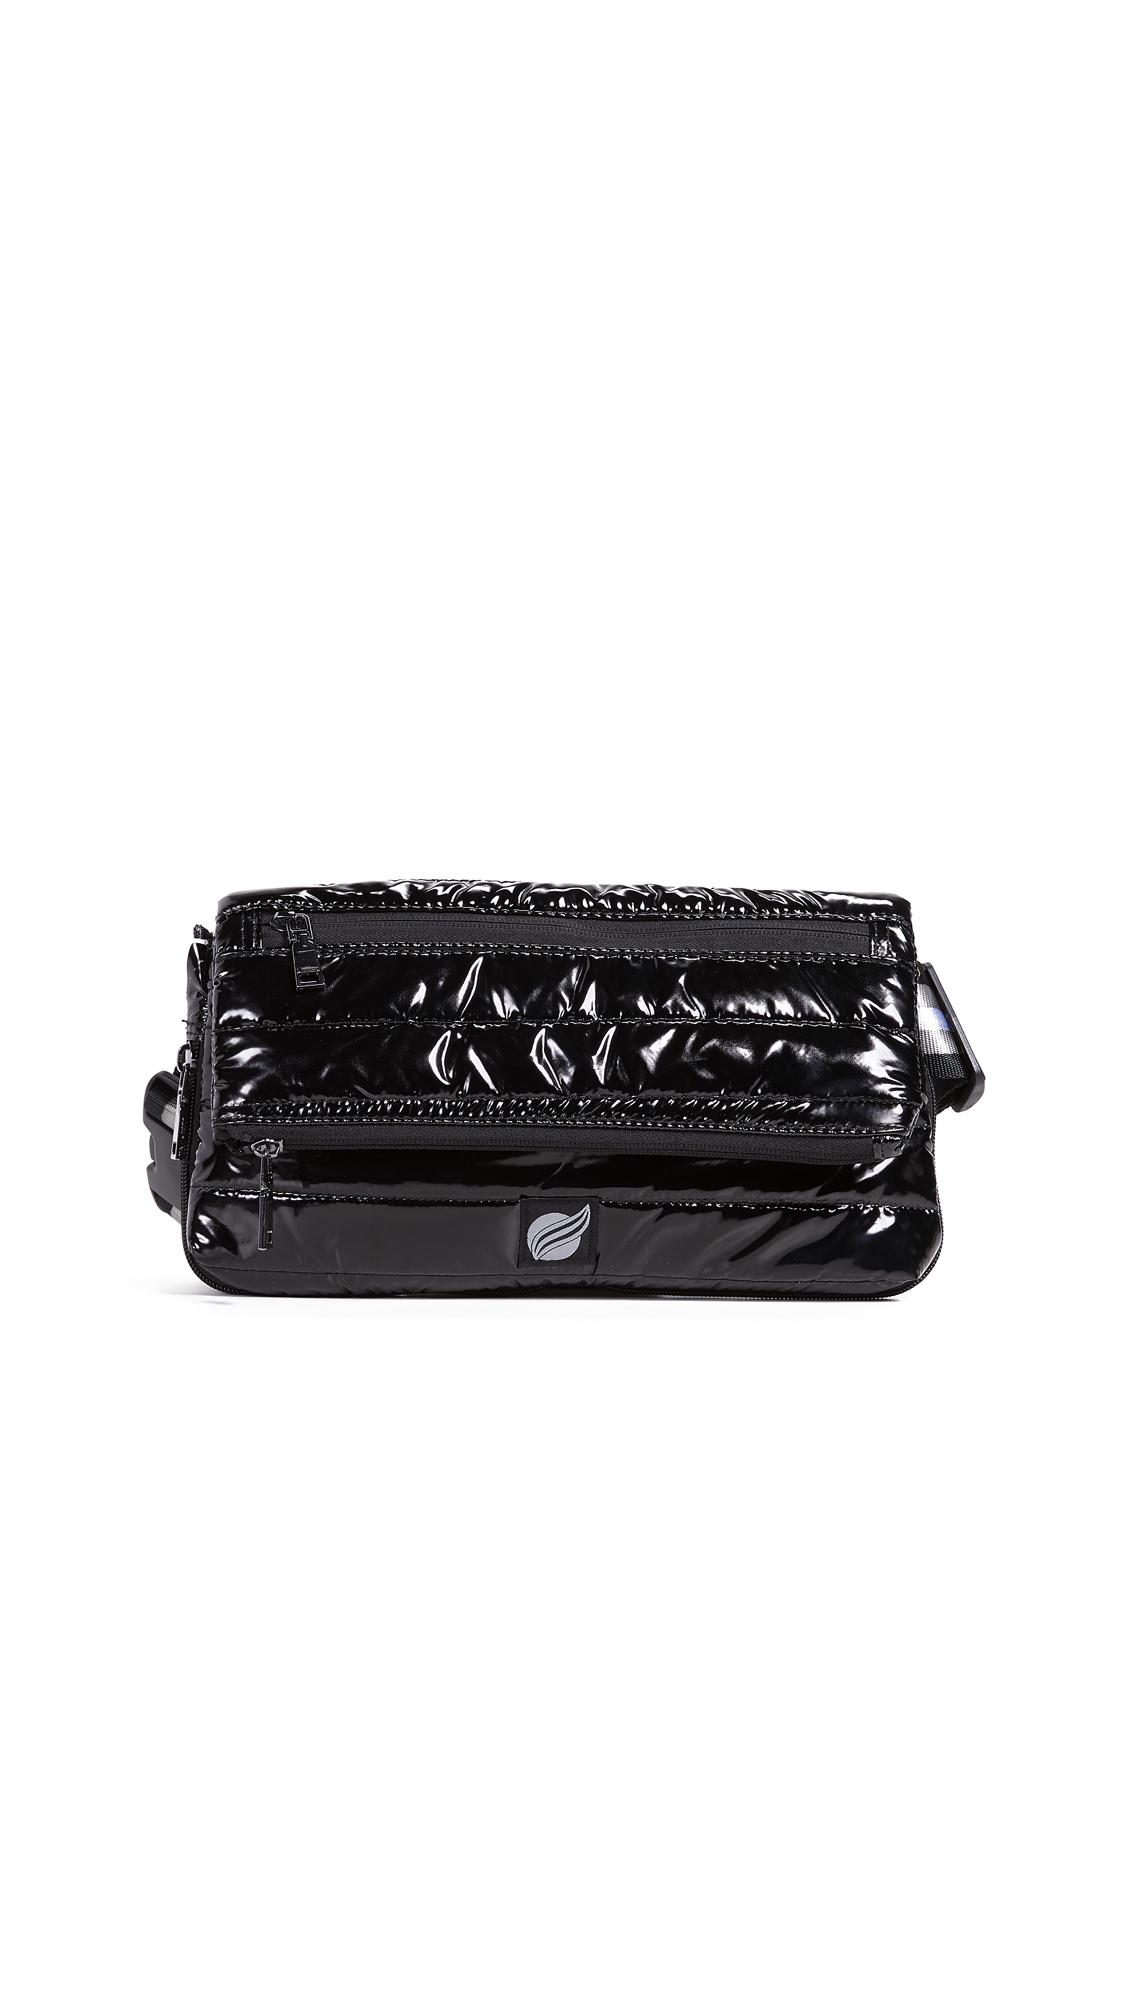 Convertible Belt Cross Body Bag, Black Patent